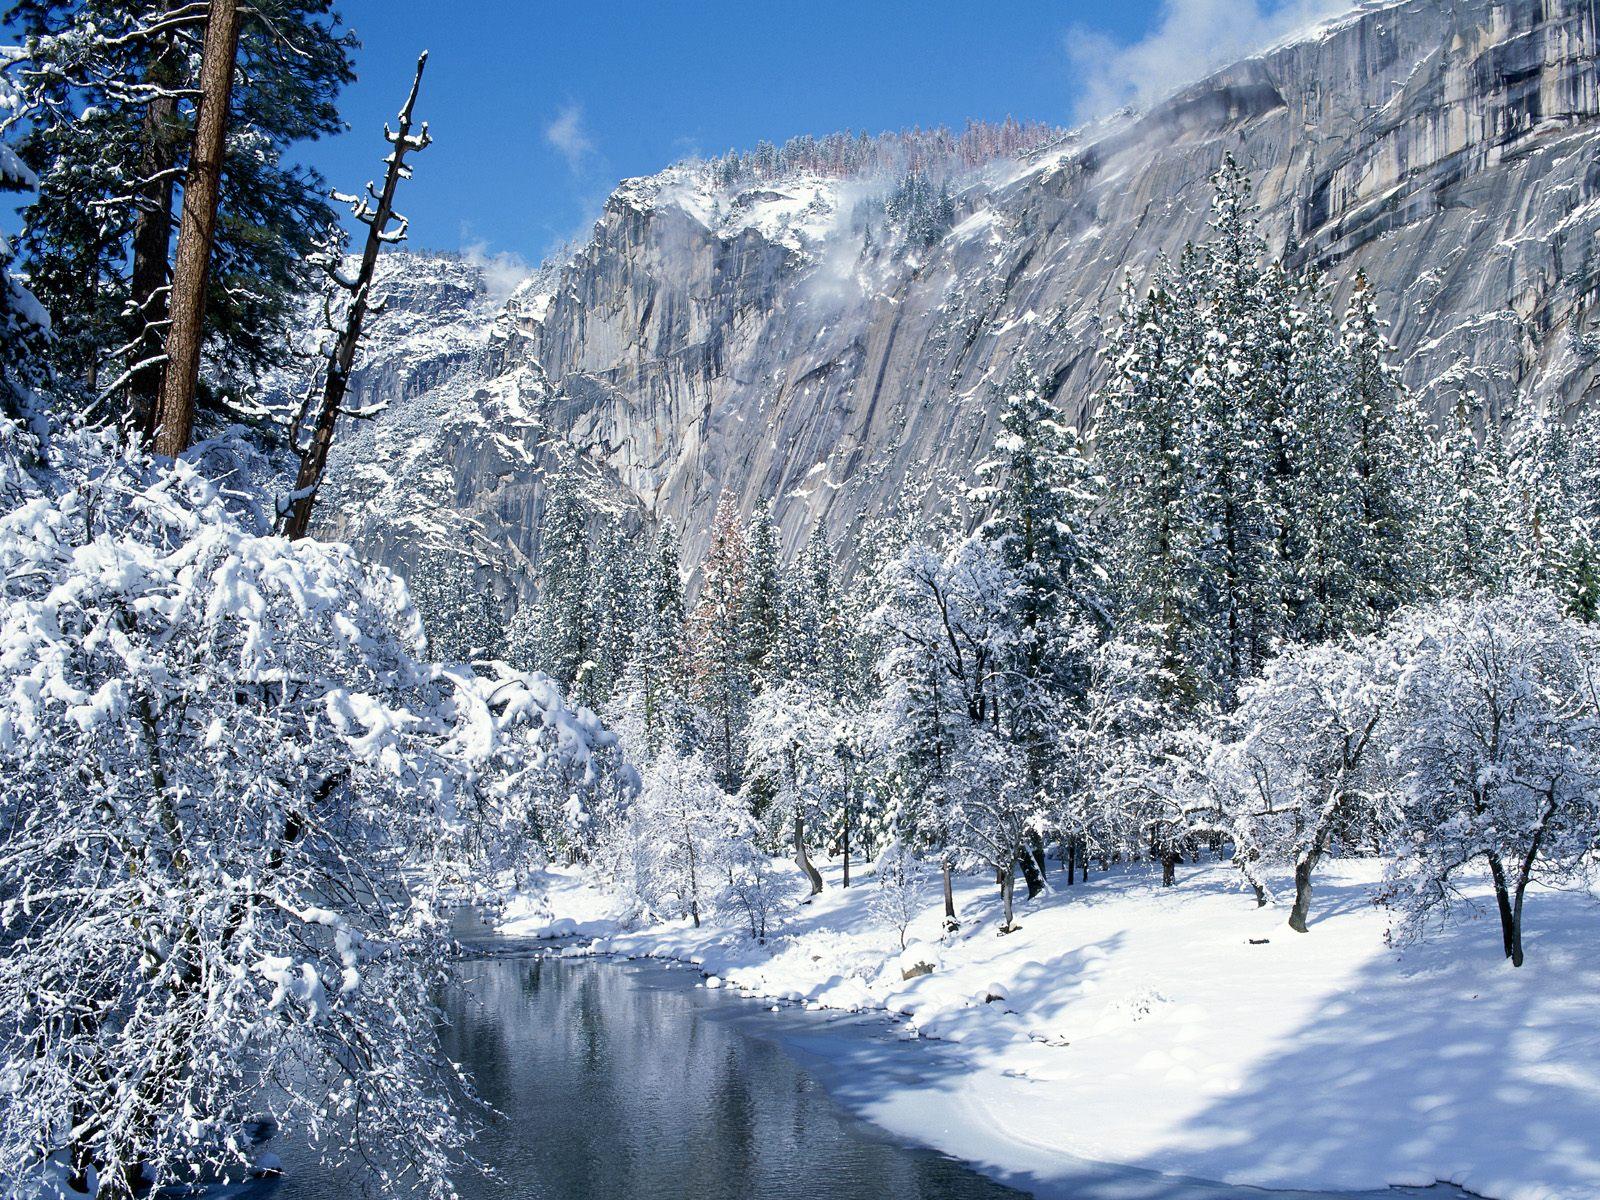 snowy scenes wallpaper christmas snowy scenes wallpaper download 1600x1200